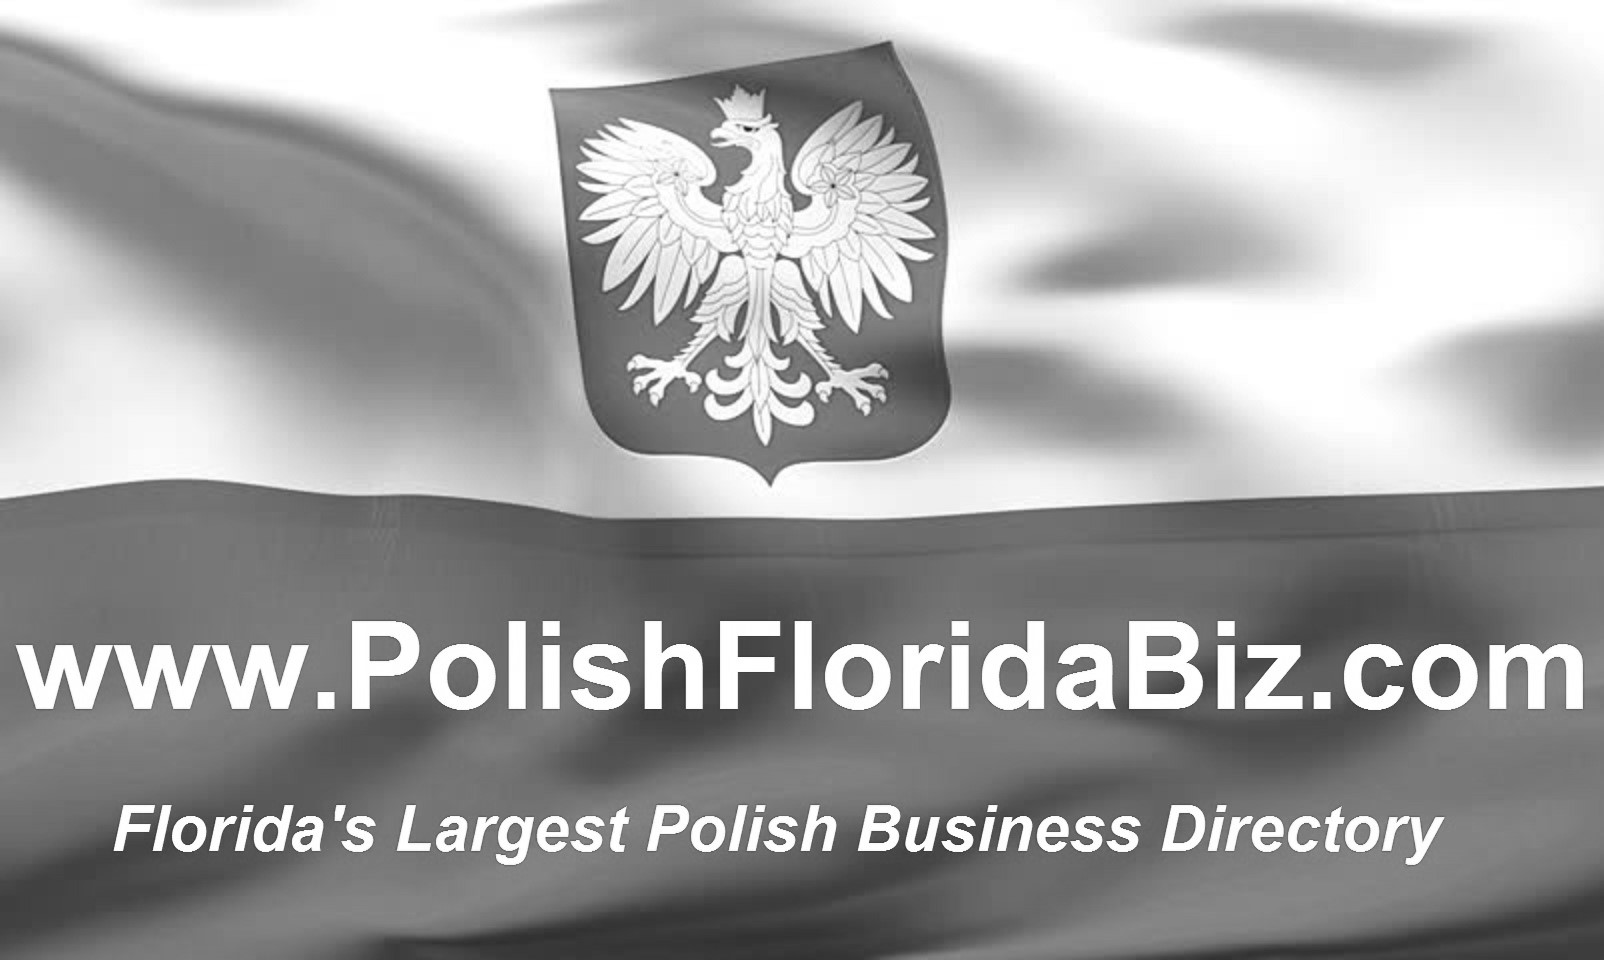 www.polishfloridabiz.com